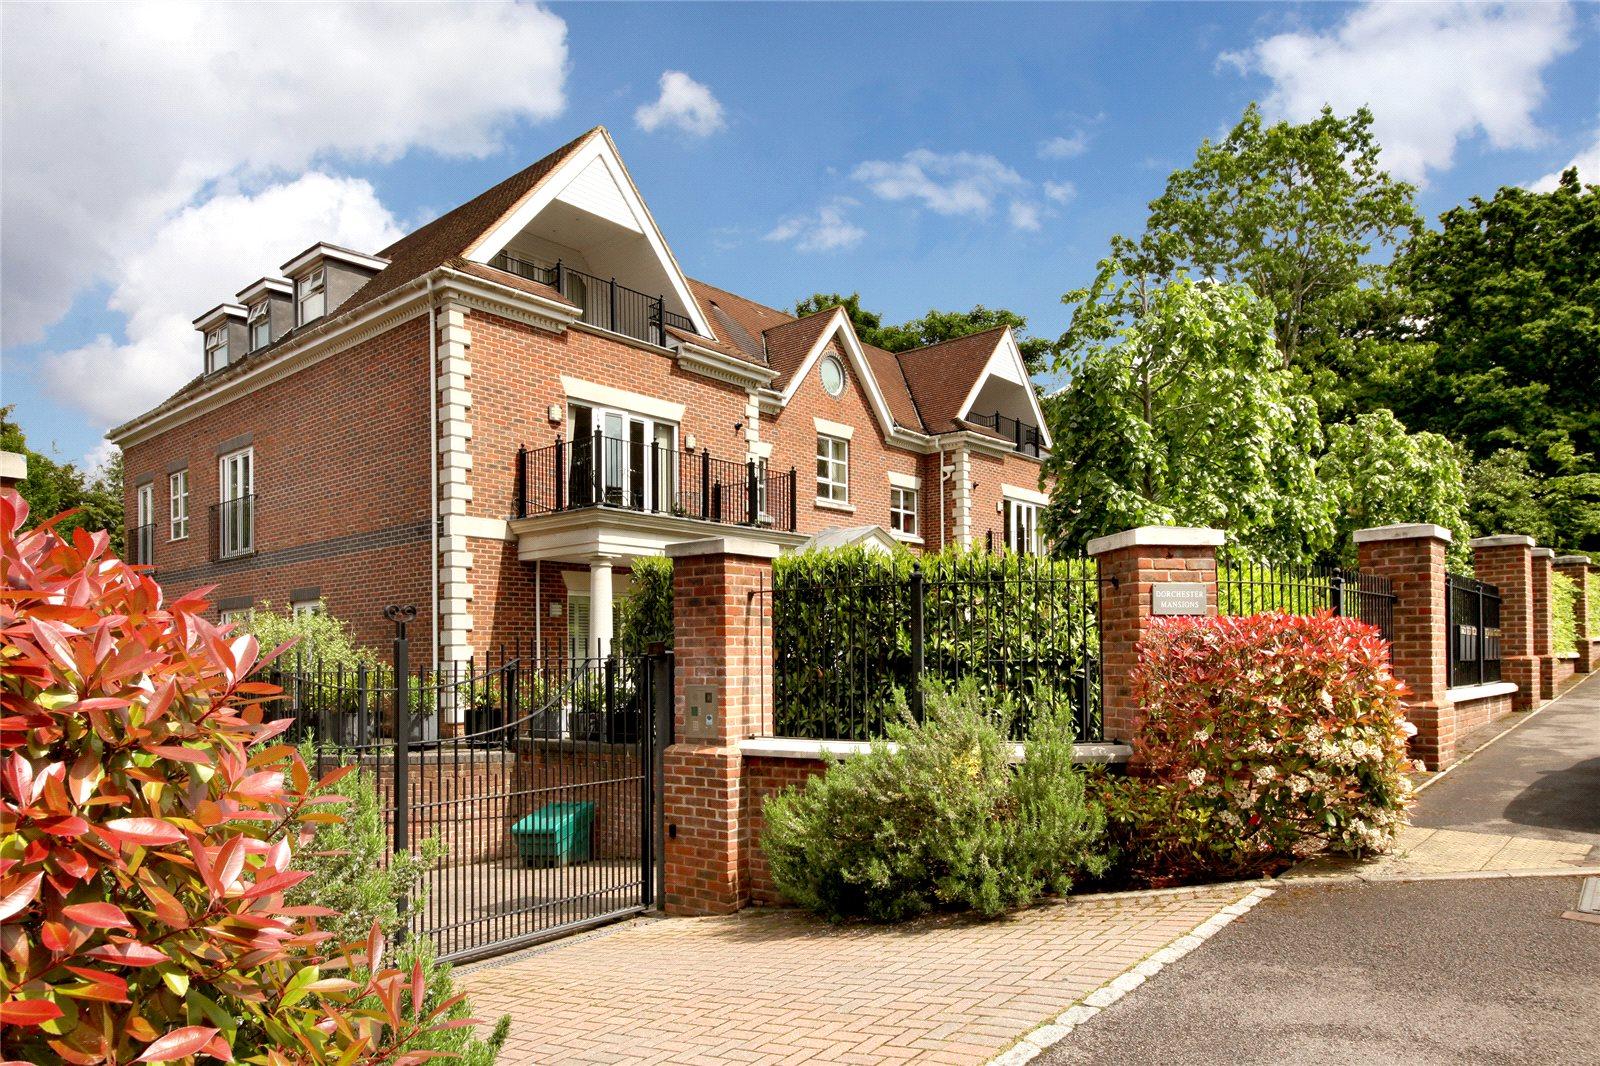 Apartamento por un Venta en Dorchester Mansions, Cross Road, Sunningdale, Berkshire, SL5 Sunningdale, Inglaterra